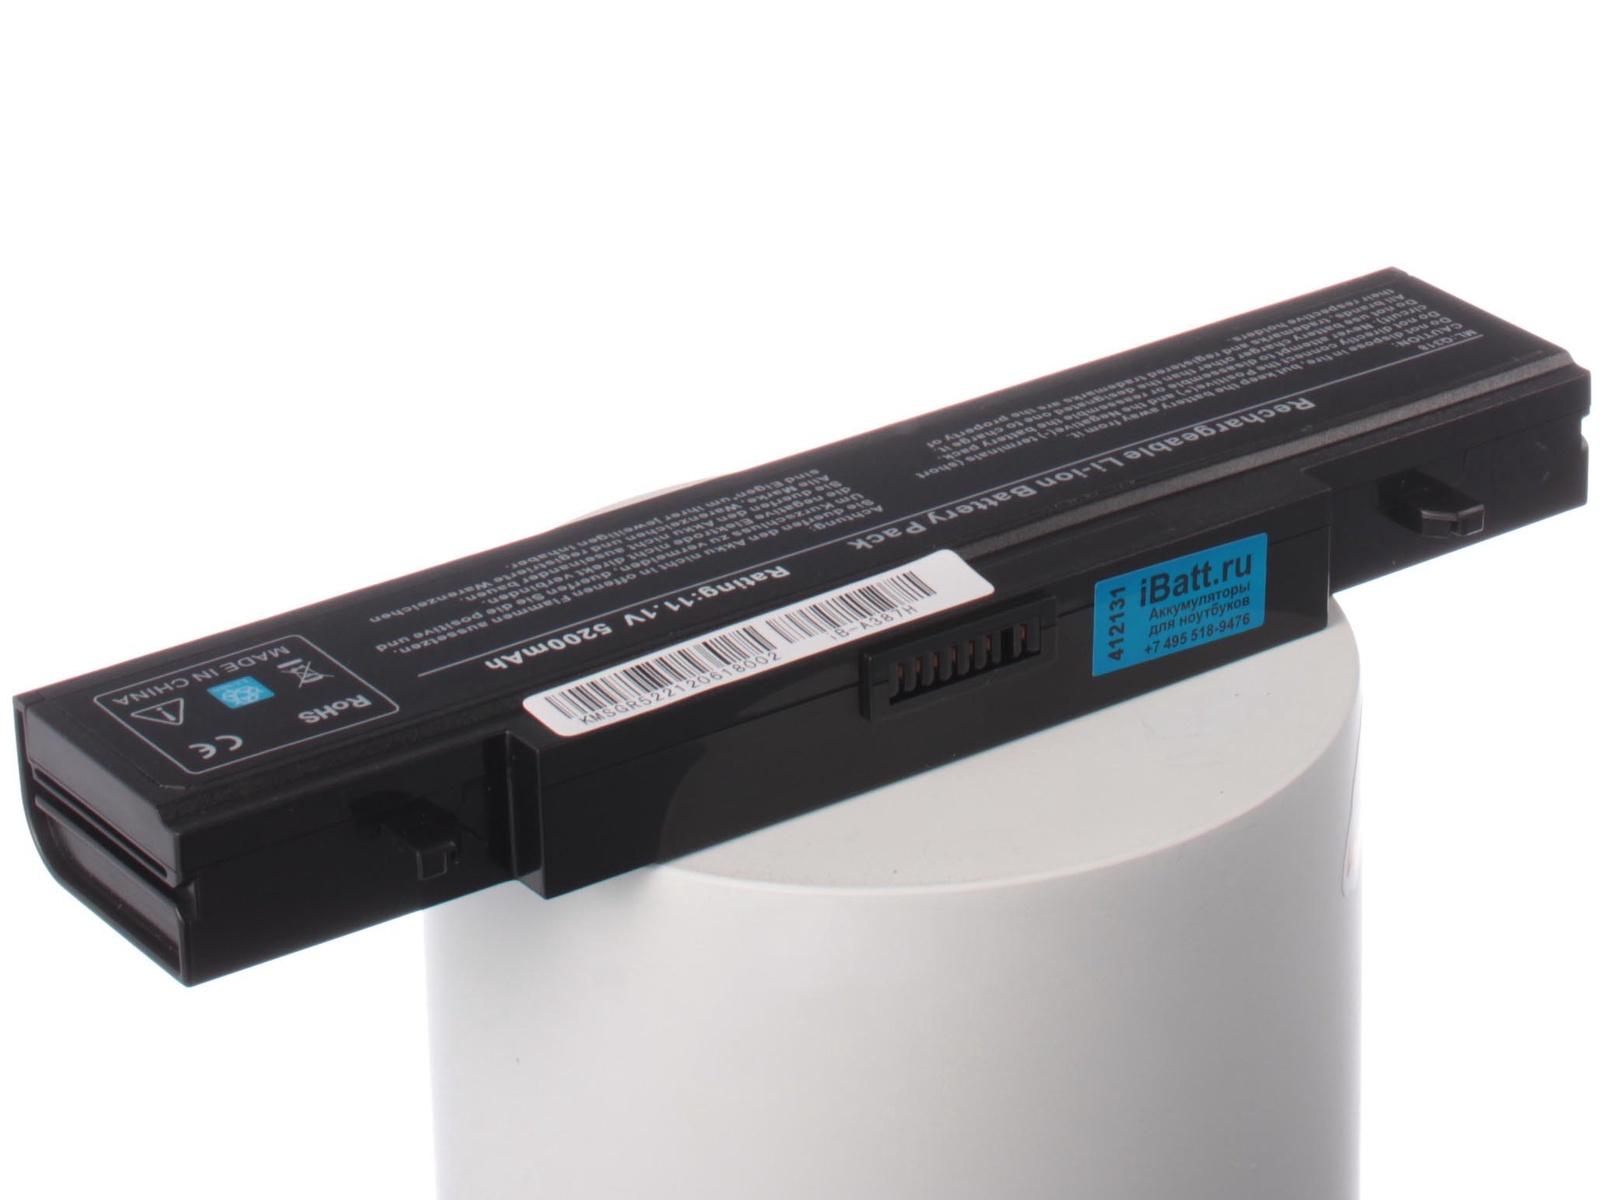 Аккумулятор для ноутбука iBatt для Samsung 300V5A-S08, 305V5Z, 355V5C-S0A, NP270E5E-X02, R590-JS01, RF710-S04, 300E7A-S08, 300E7A-S0B, 350E7X, 355E5C-S05, R425-JU04, R440-JT03, R730-JA06, R780-JS09, RV410-S01, RV511-S02 аккумулятор для ноутбука anybatt для samsung rc530 s09 rf511 s03 rv410 a02 rv520 s08 rv718 np270e5e x02 rf710 s04 r440 jt03 r730 ja06 r780 js09 rv410 s01 rv511 s02 rv711 a01 r780 js02 rf712 s01 np270e5e k02